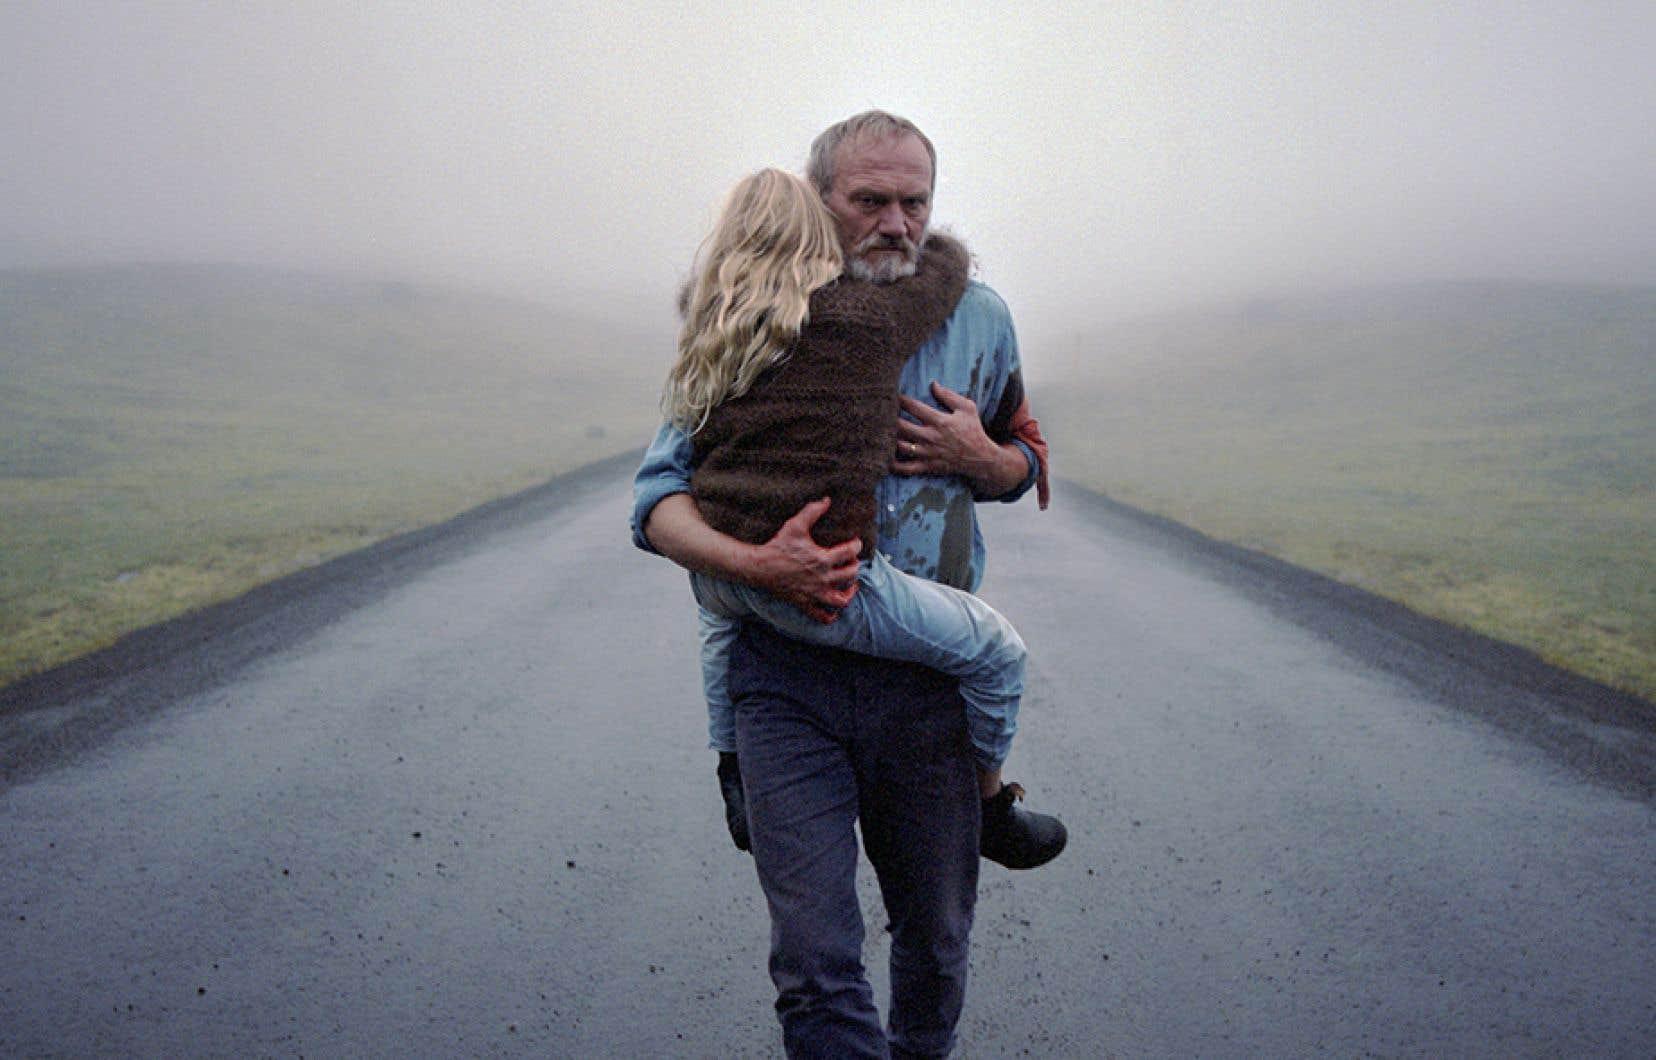 L'enquêteur Ingimundur (Ingvar E. Sigurðsson, magistral) ne semble serein qu'en compagnie de sa petite-fille Salka (fabuleuse Ída Mekkín Hlynsdóttir) dans «Brumes d'Islande» de Hlynur Pálmason.